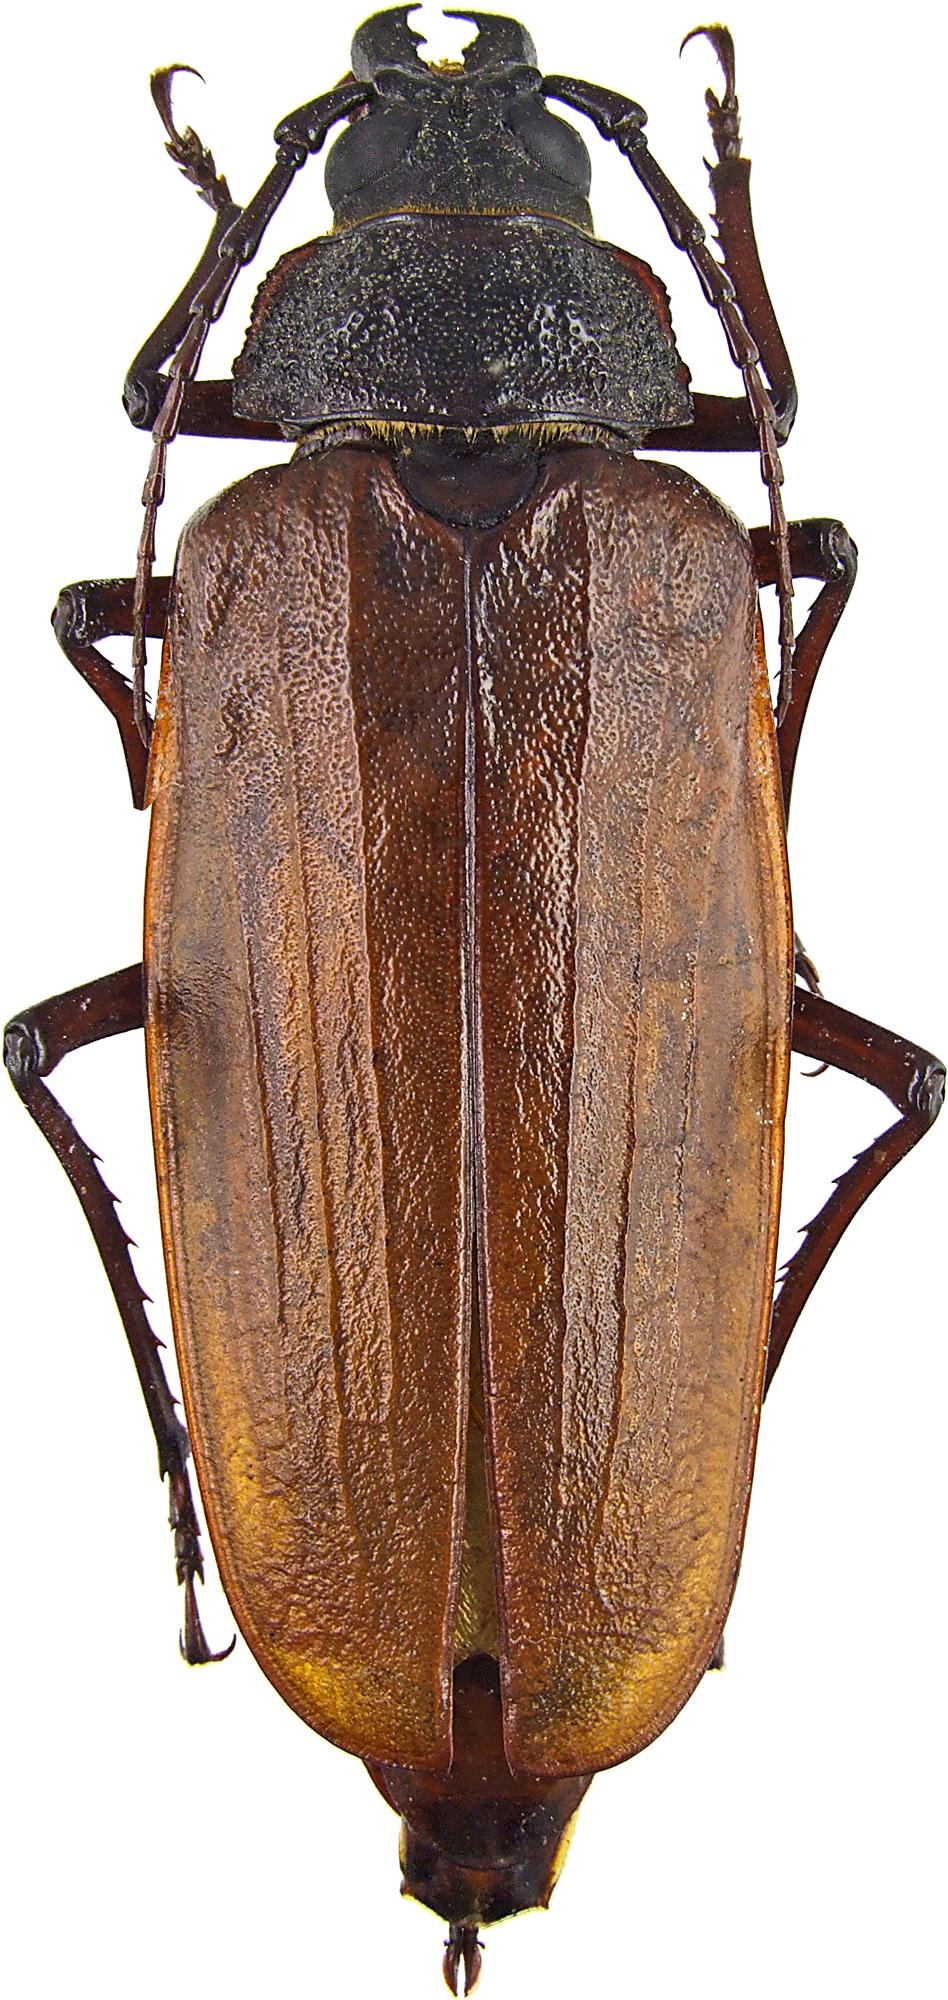 Apotrophus simplicicollis 46267cz70.jpg